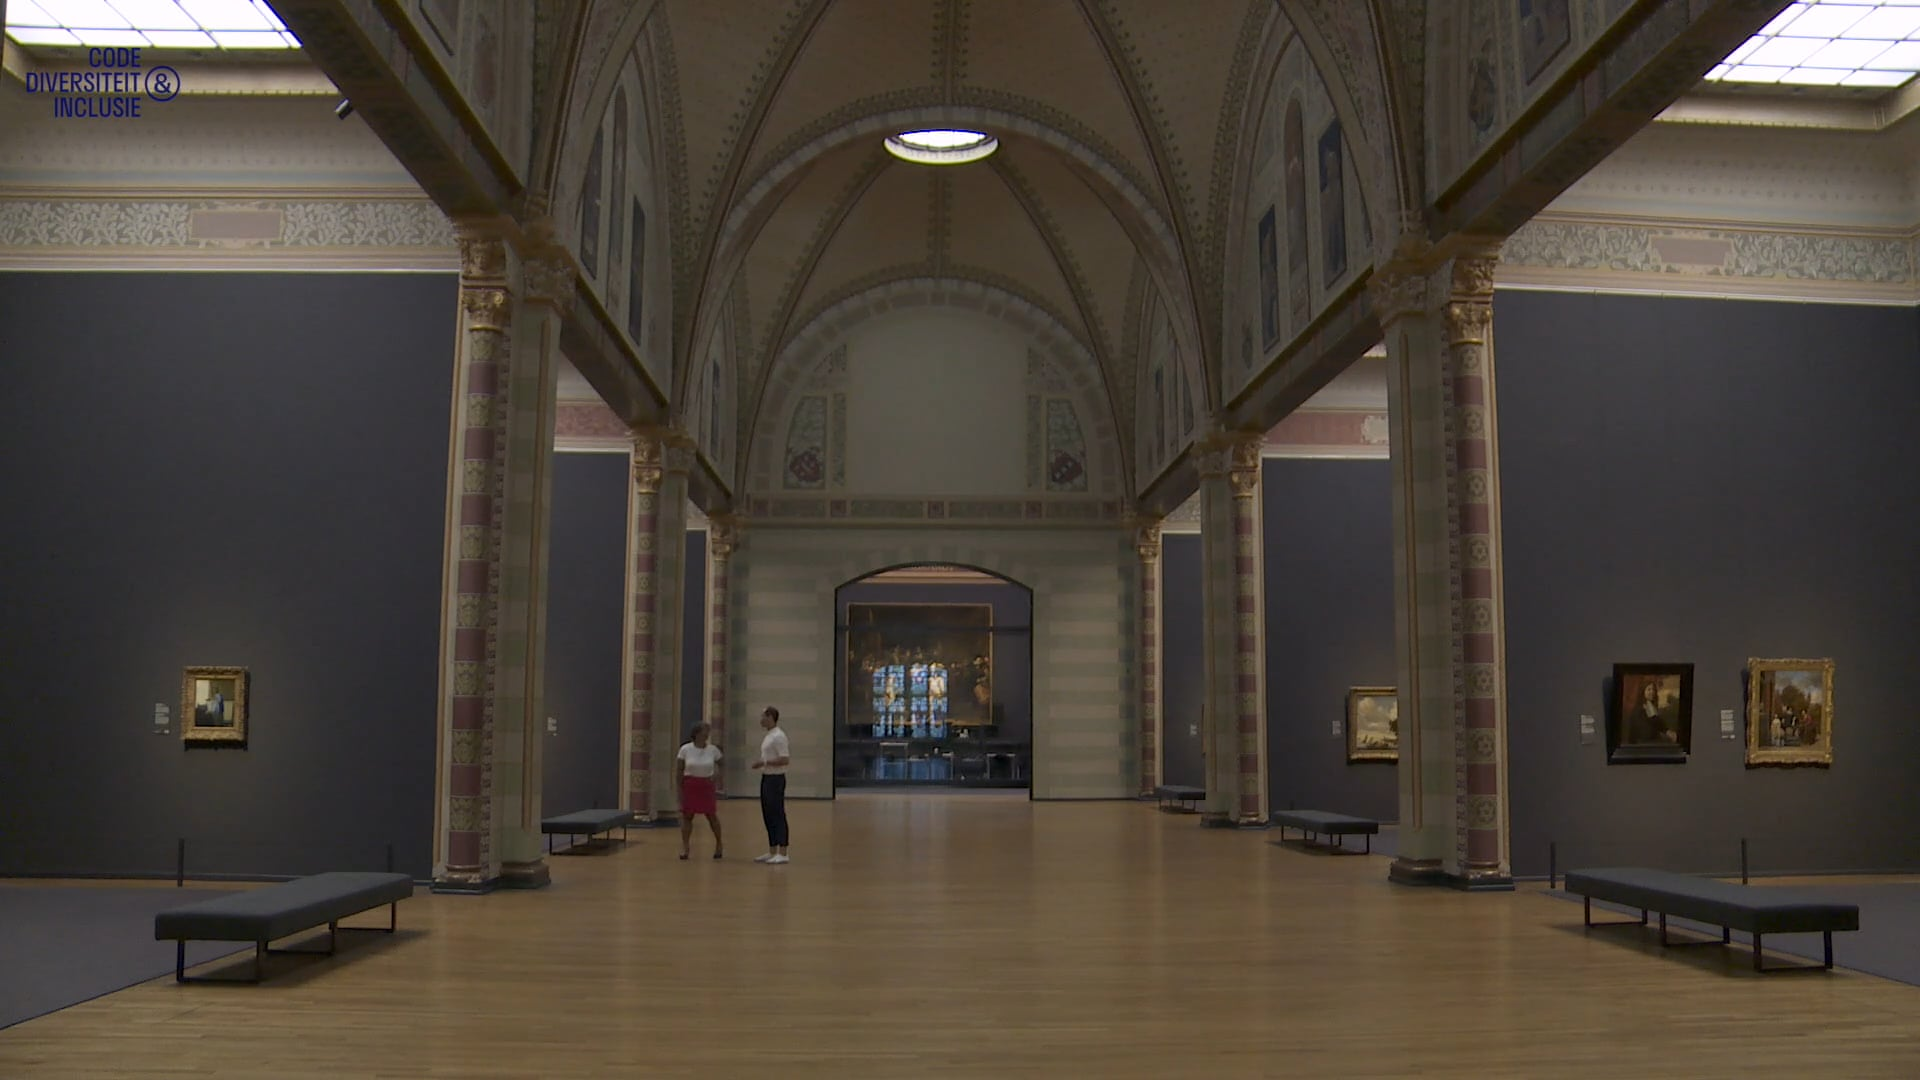 Rijksmuseum, Van Binnenuit